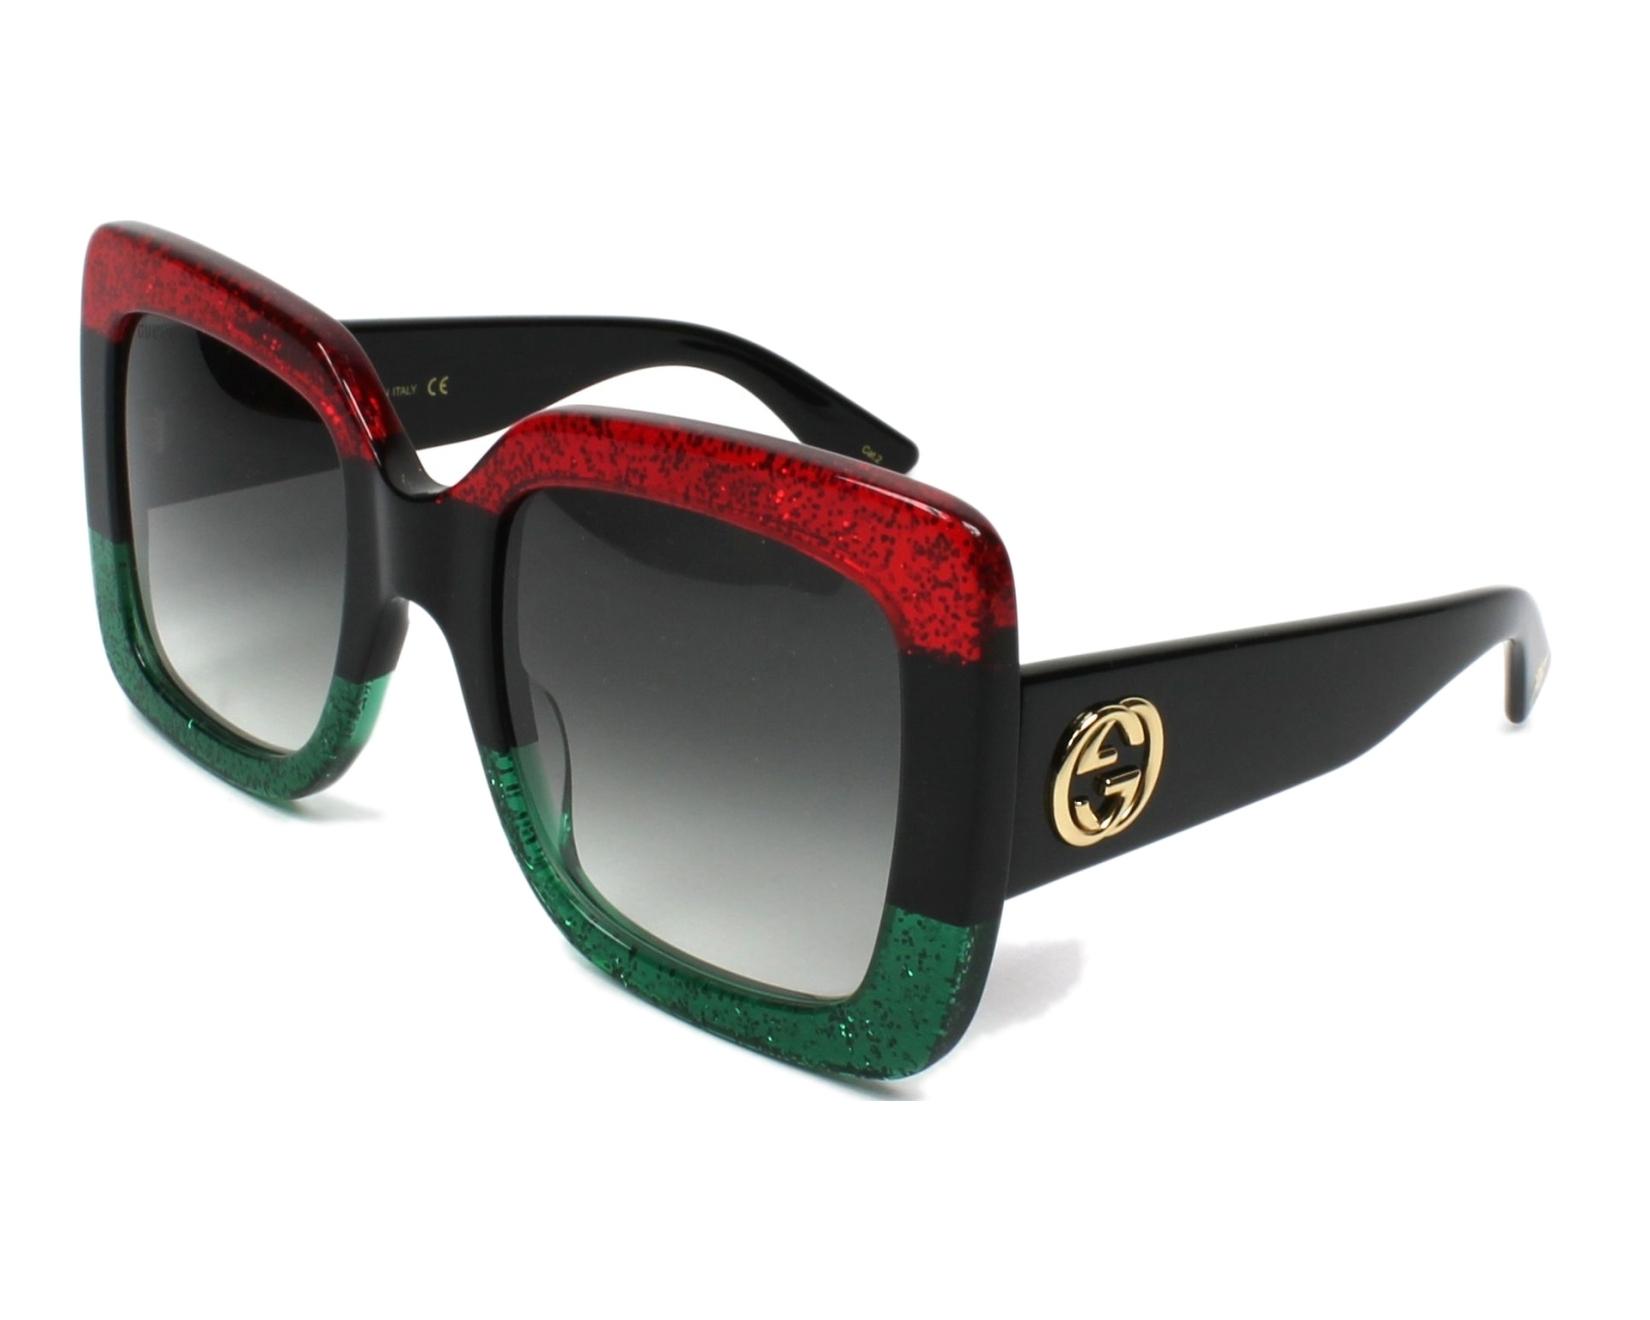 afd293ac801 Sunglasses Gucci GG-0083-S 001 55-24 Red Black profile view